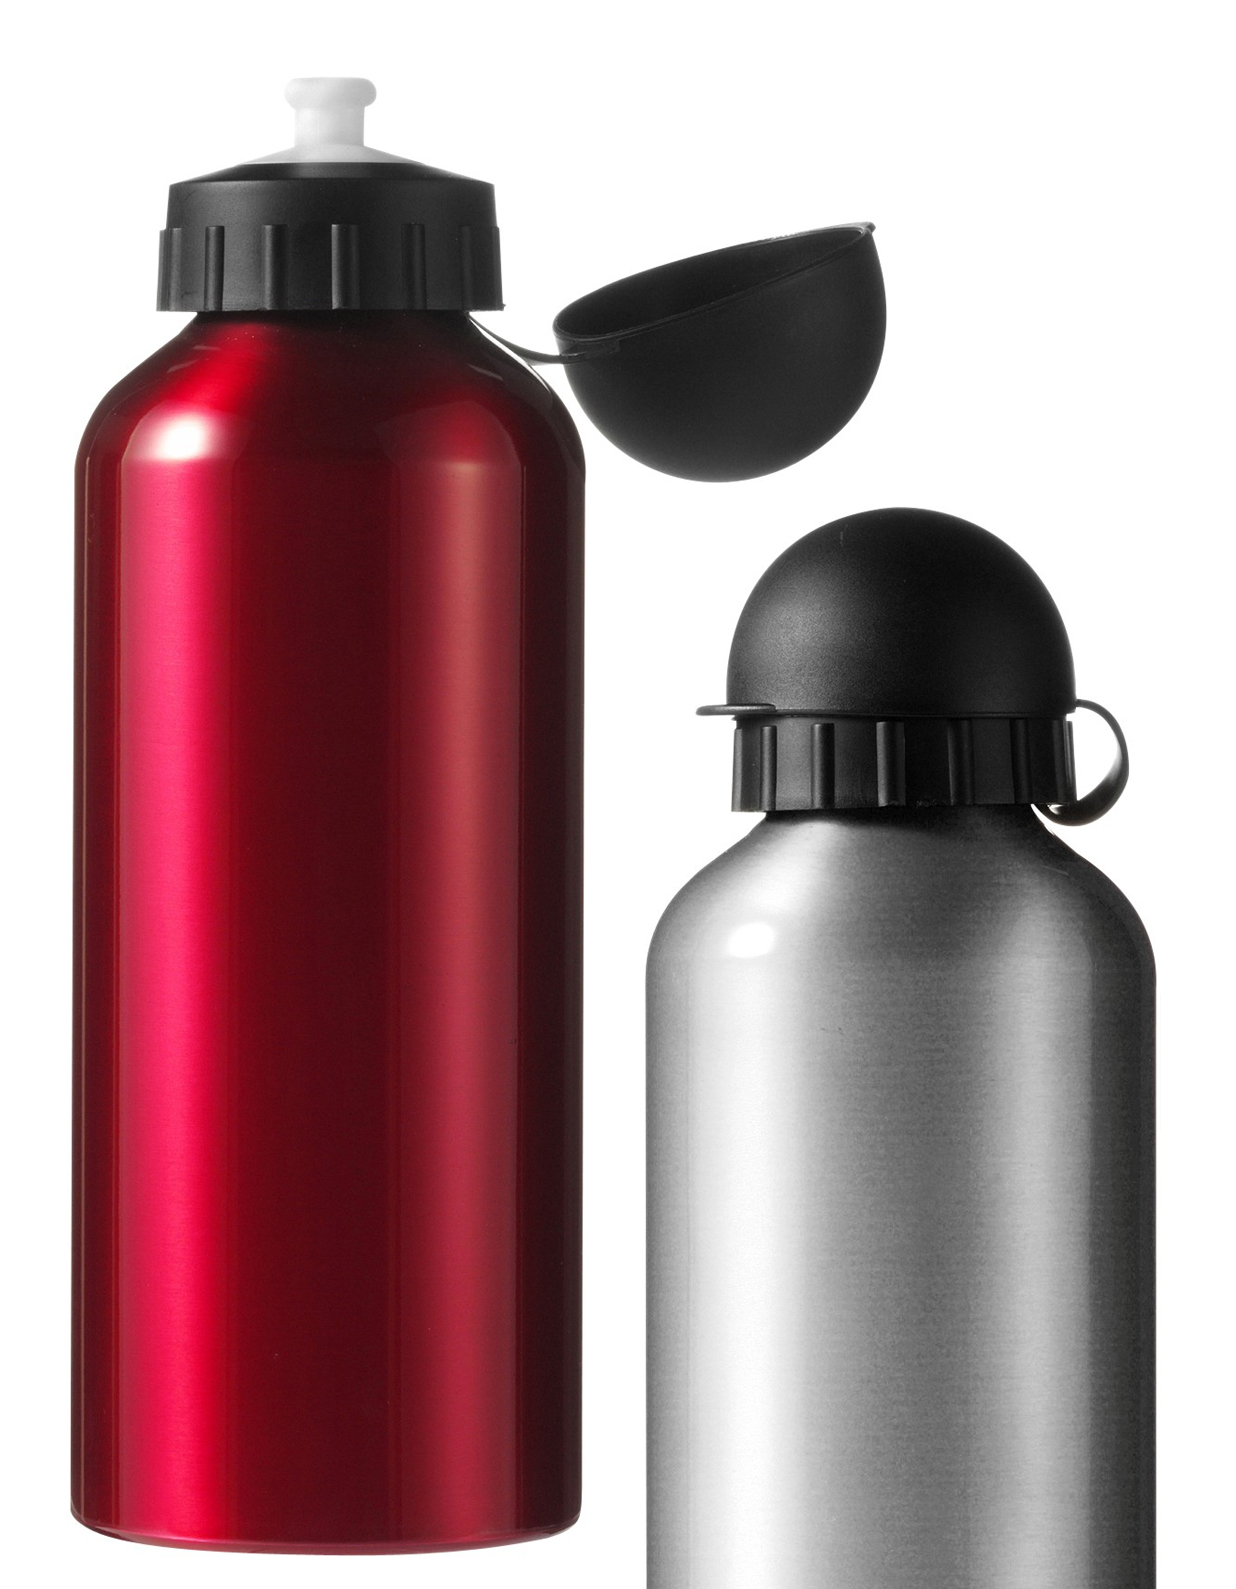 Promotional Metal drinking bottle